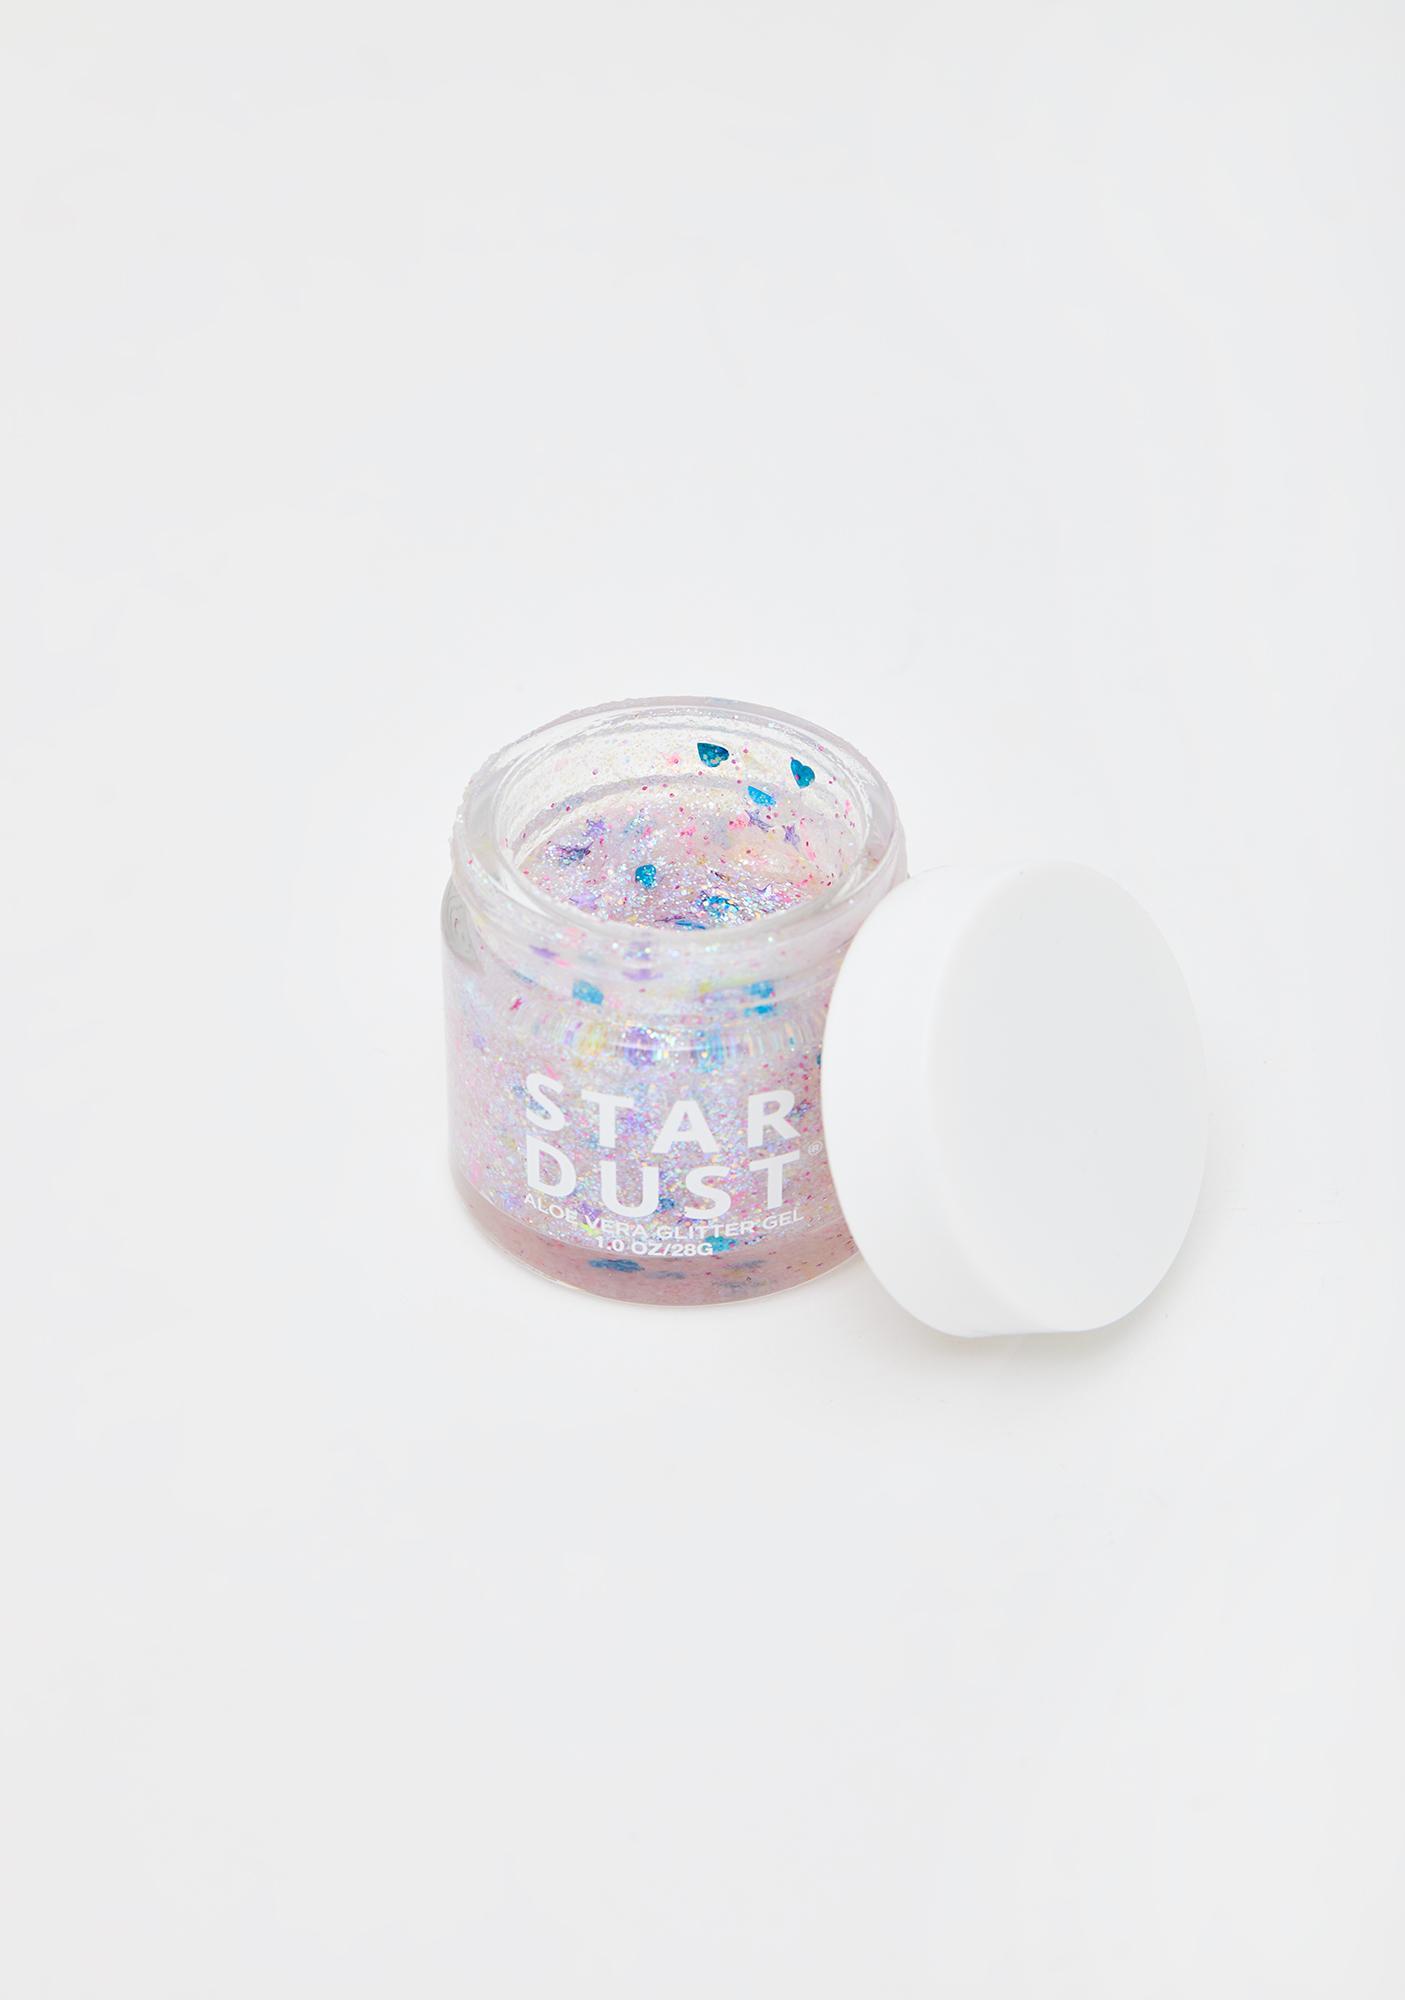 Lavender Stardust Party Stardust Glitter Gel Pot